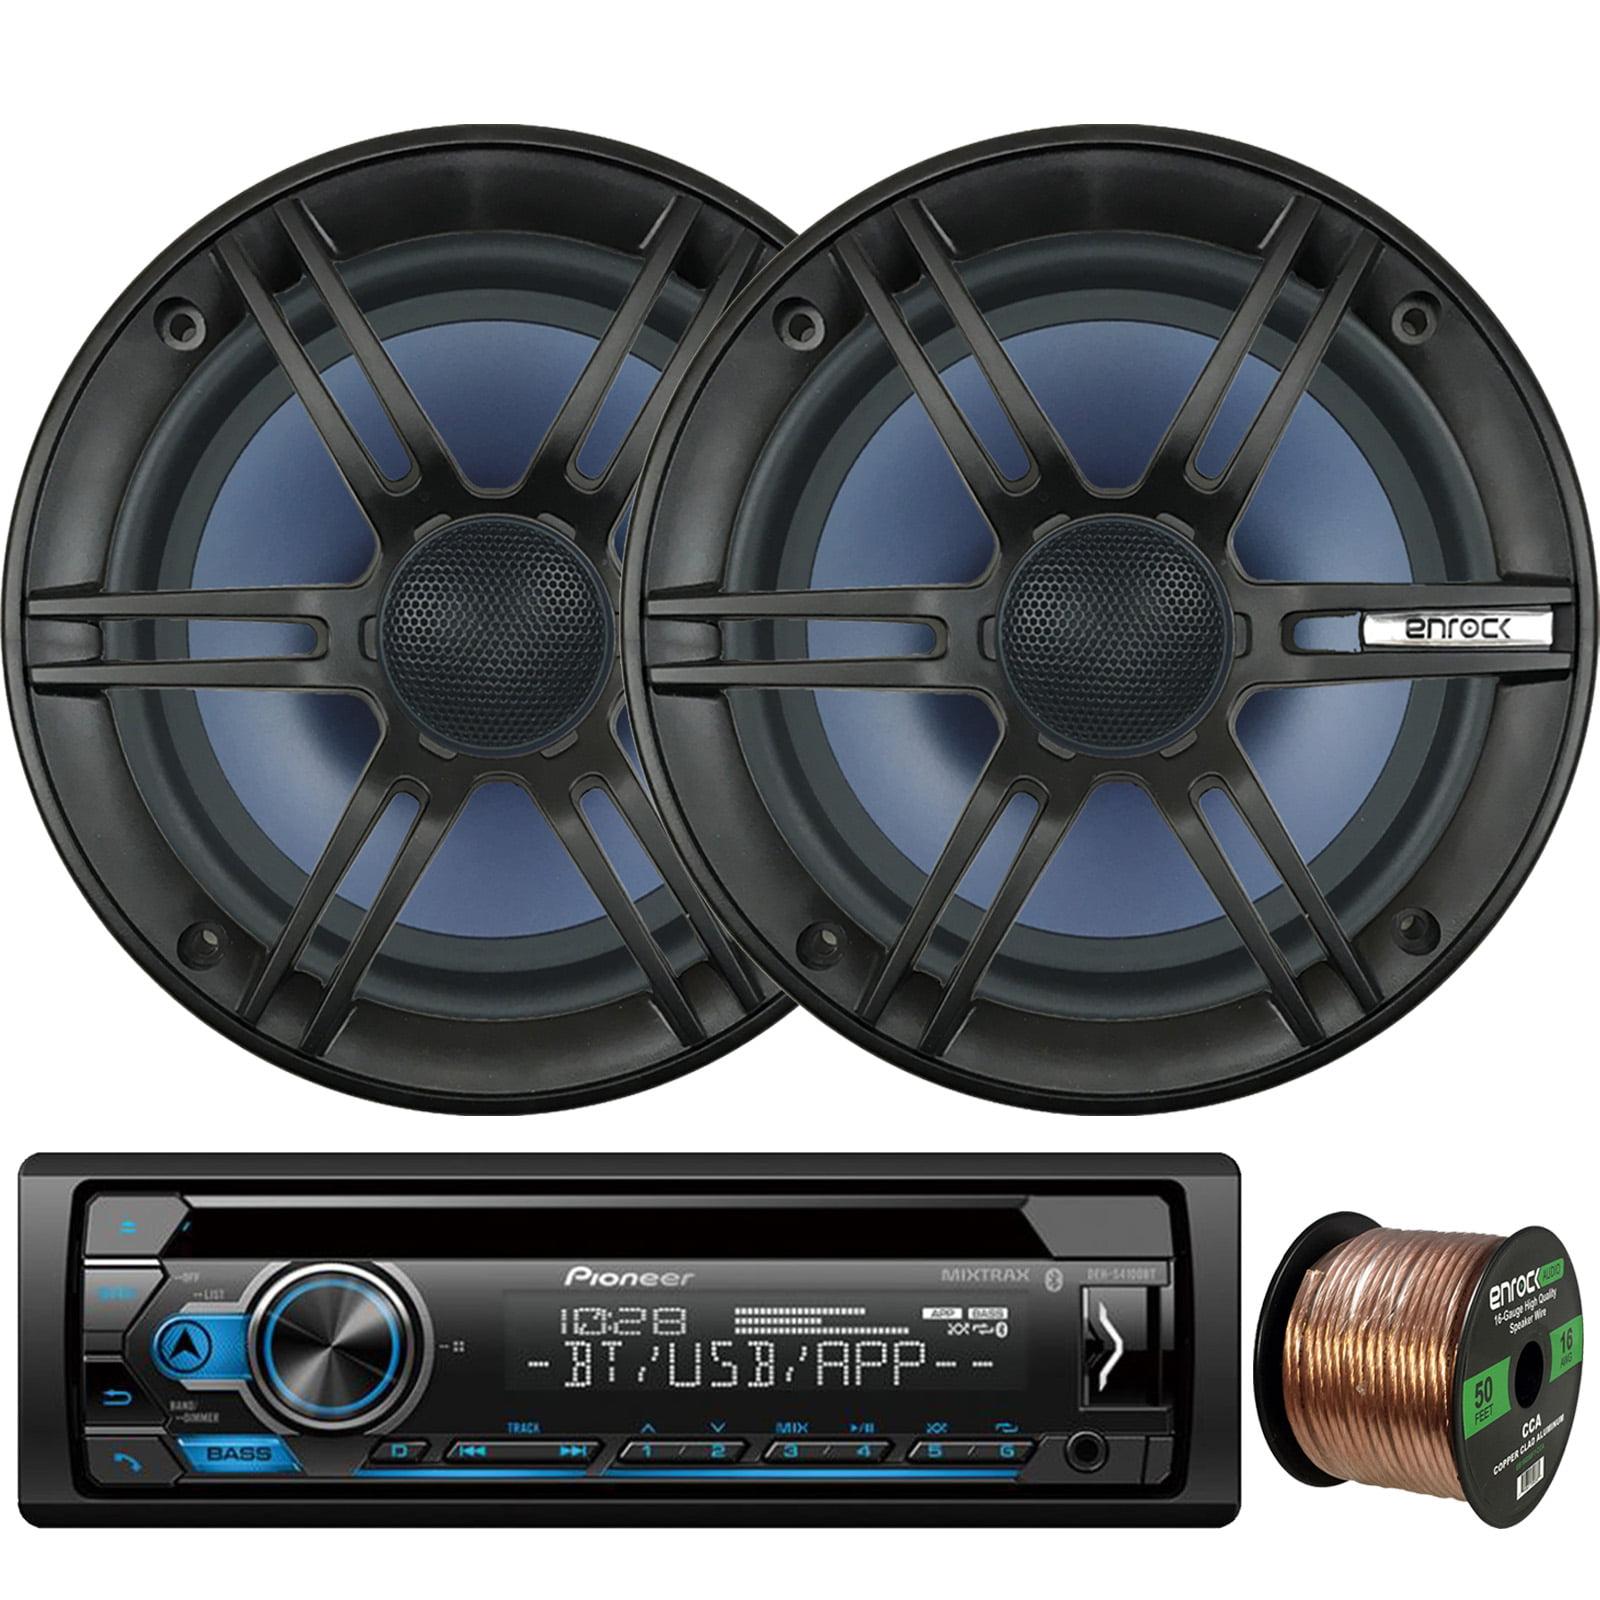 "Pioneer DEH-S4100BT In-Dash Single-DIN CD Player Bluetooth Receiver, 2 x Enrock Audio 6.5"" 2-Way Marine-Grade Coaxial Car/Boat Audio Stereo Speakers, 16-Gauge 50Ft. Speaker Wire"